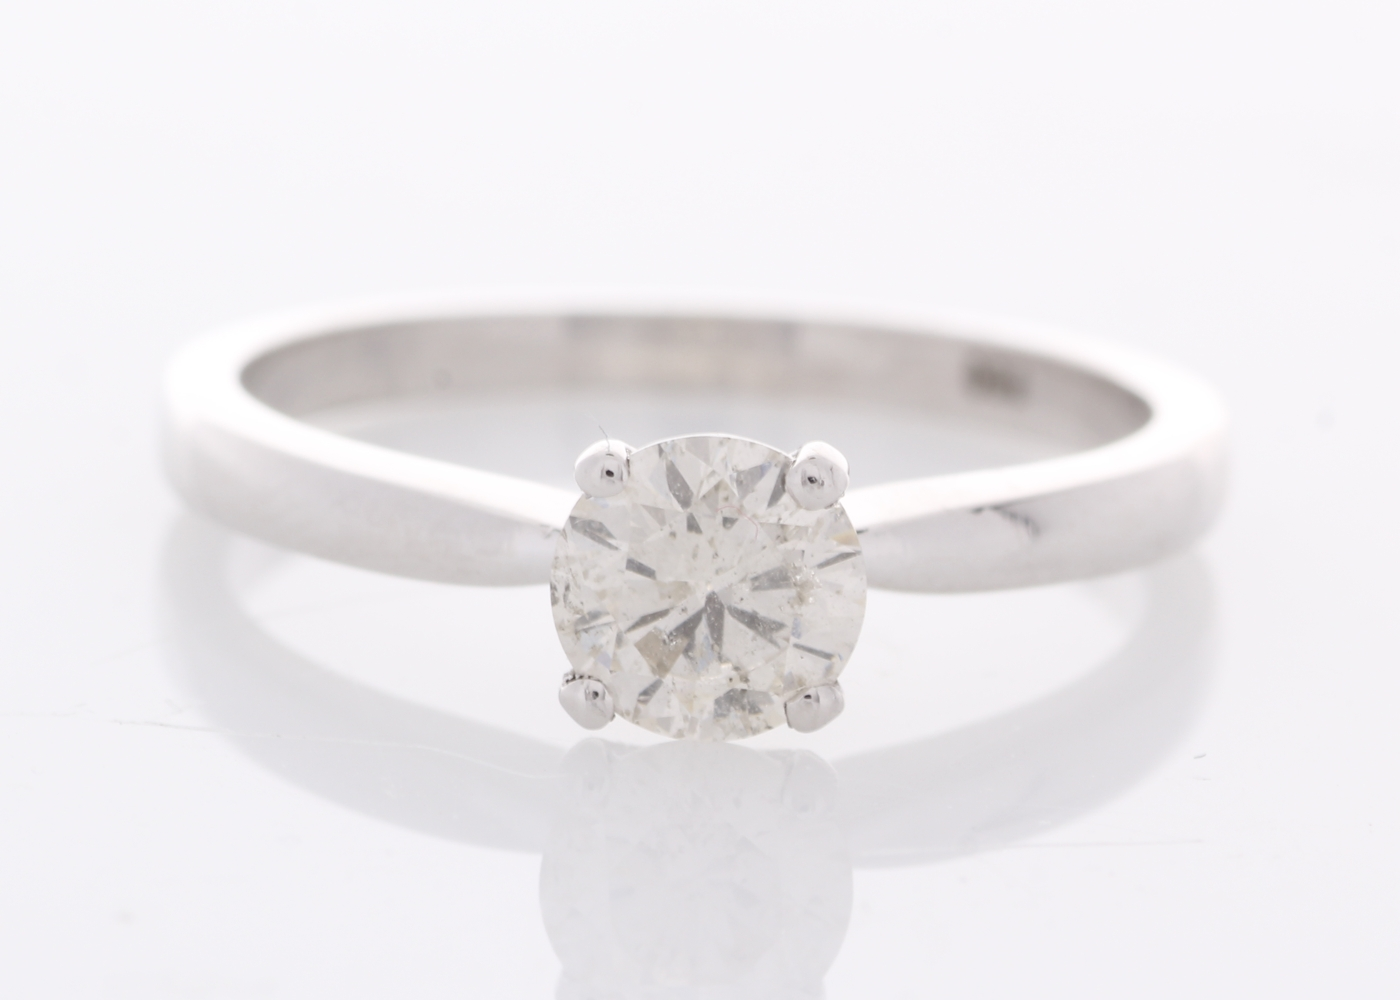 18k White Gold Prong Set Diamond Ring 0.57 Carats